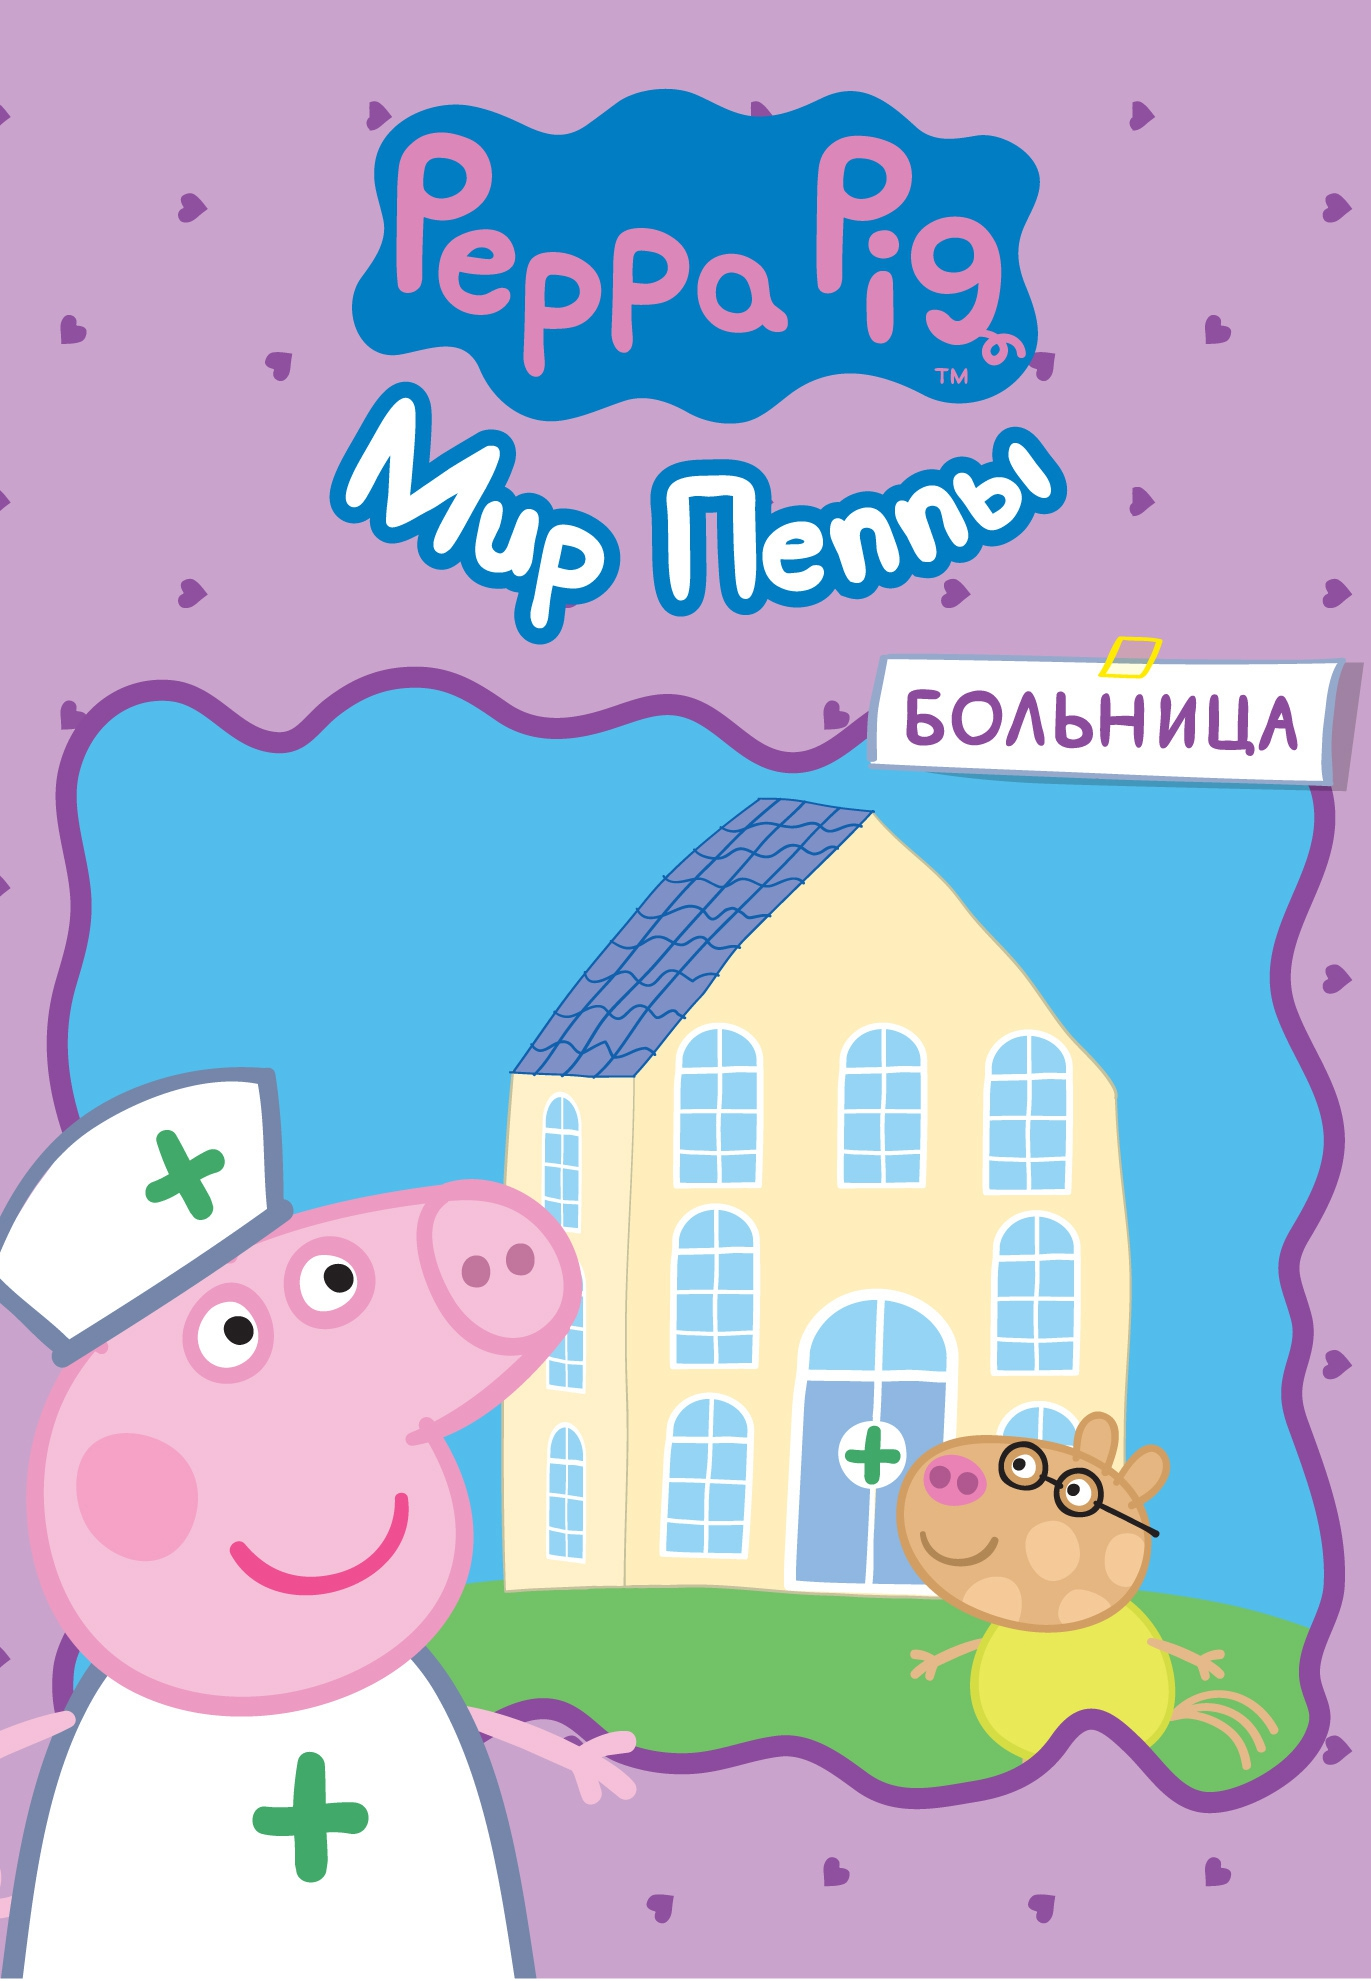 Peppa Pig Peppa Pig Игровой набор Peppa Pig «Мир Пеппы» peppa pig пазл для малышей хобби 6 в 1